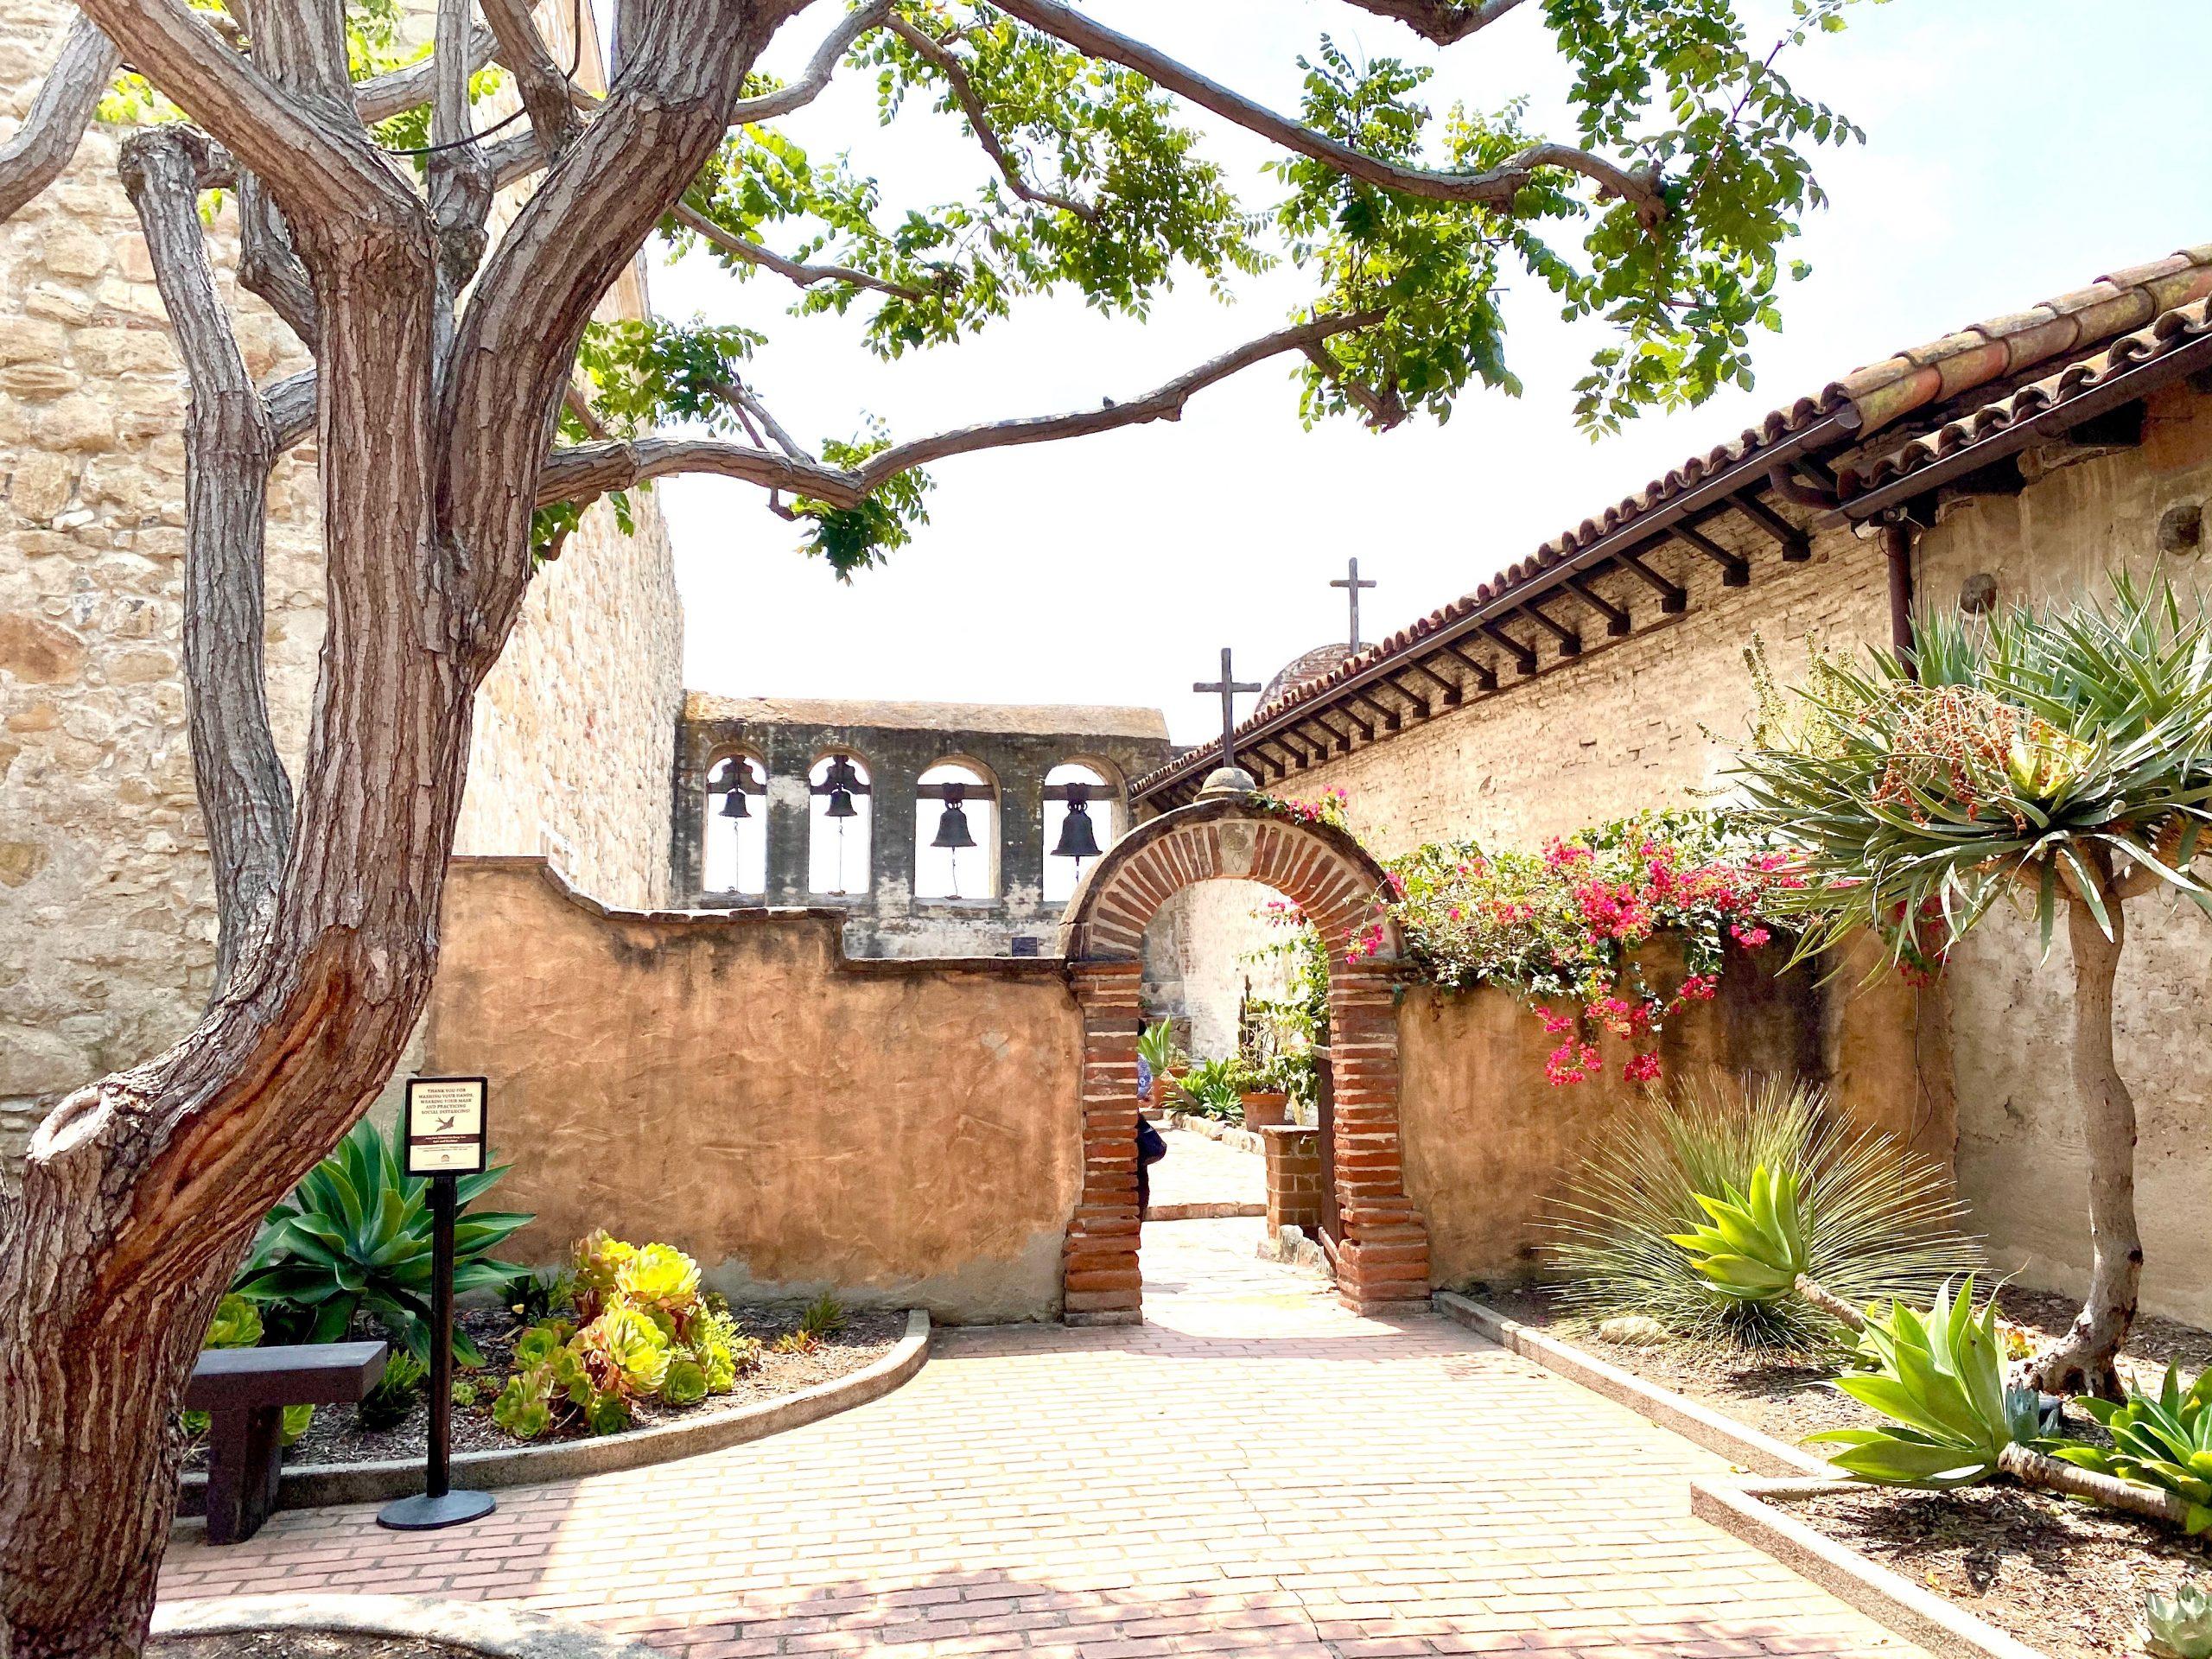 The famous mission bells at Mission San Juan Capistrano, CA